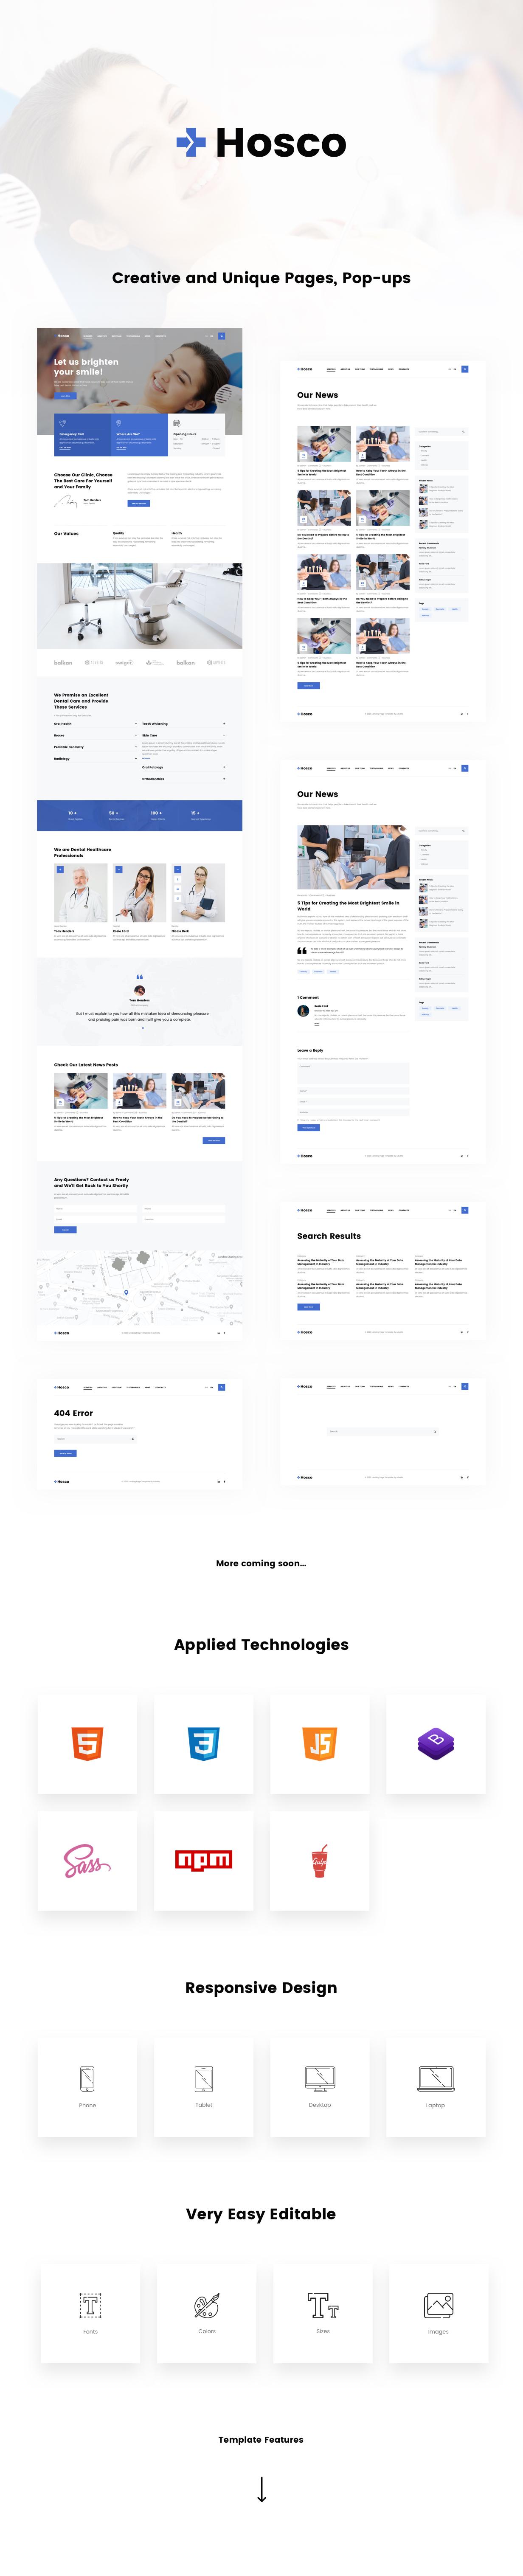 Hosco HTML Presentation